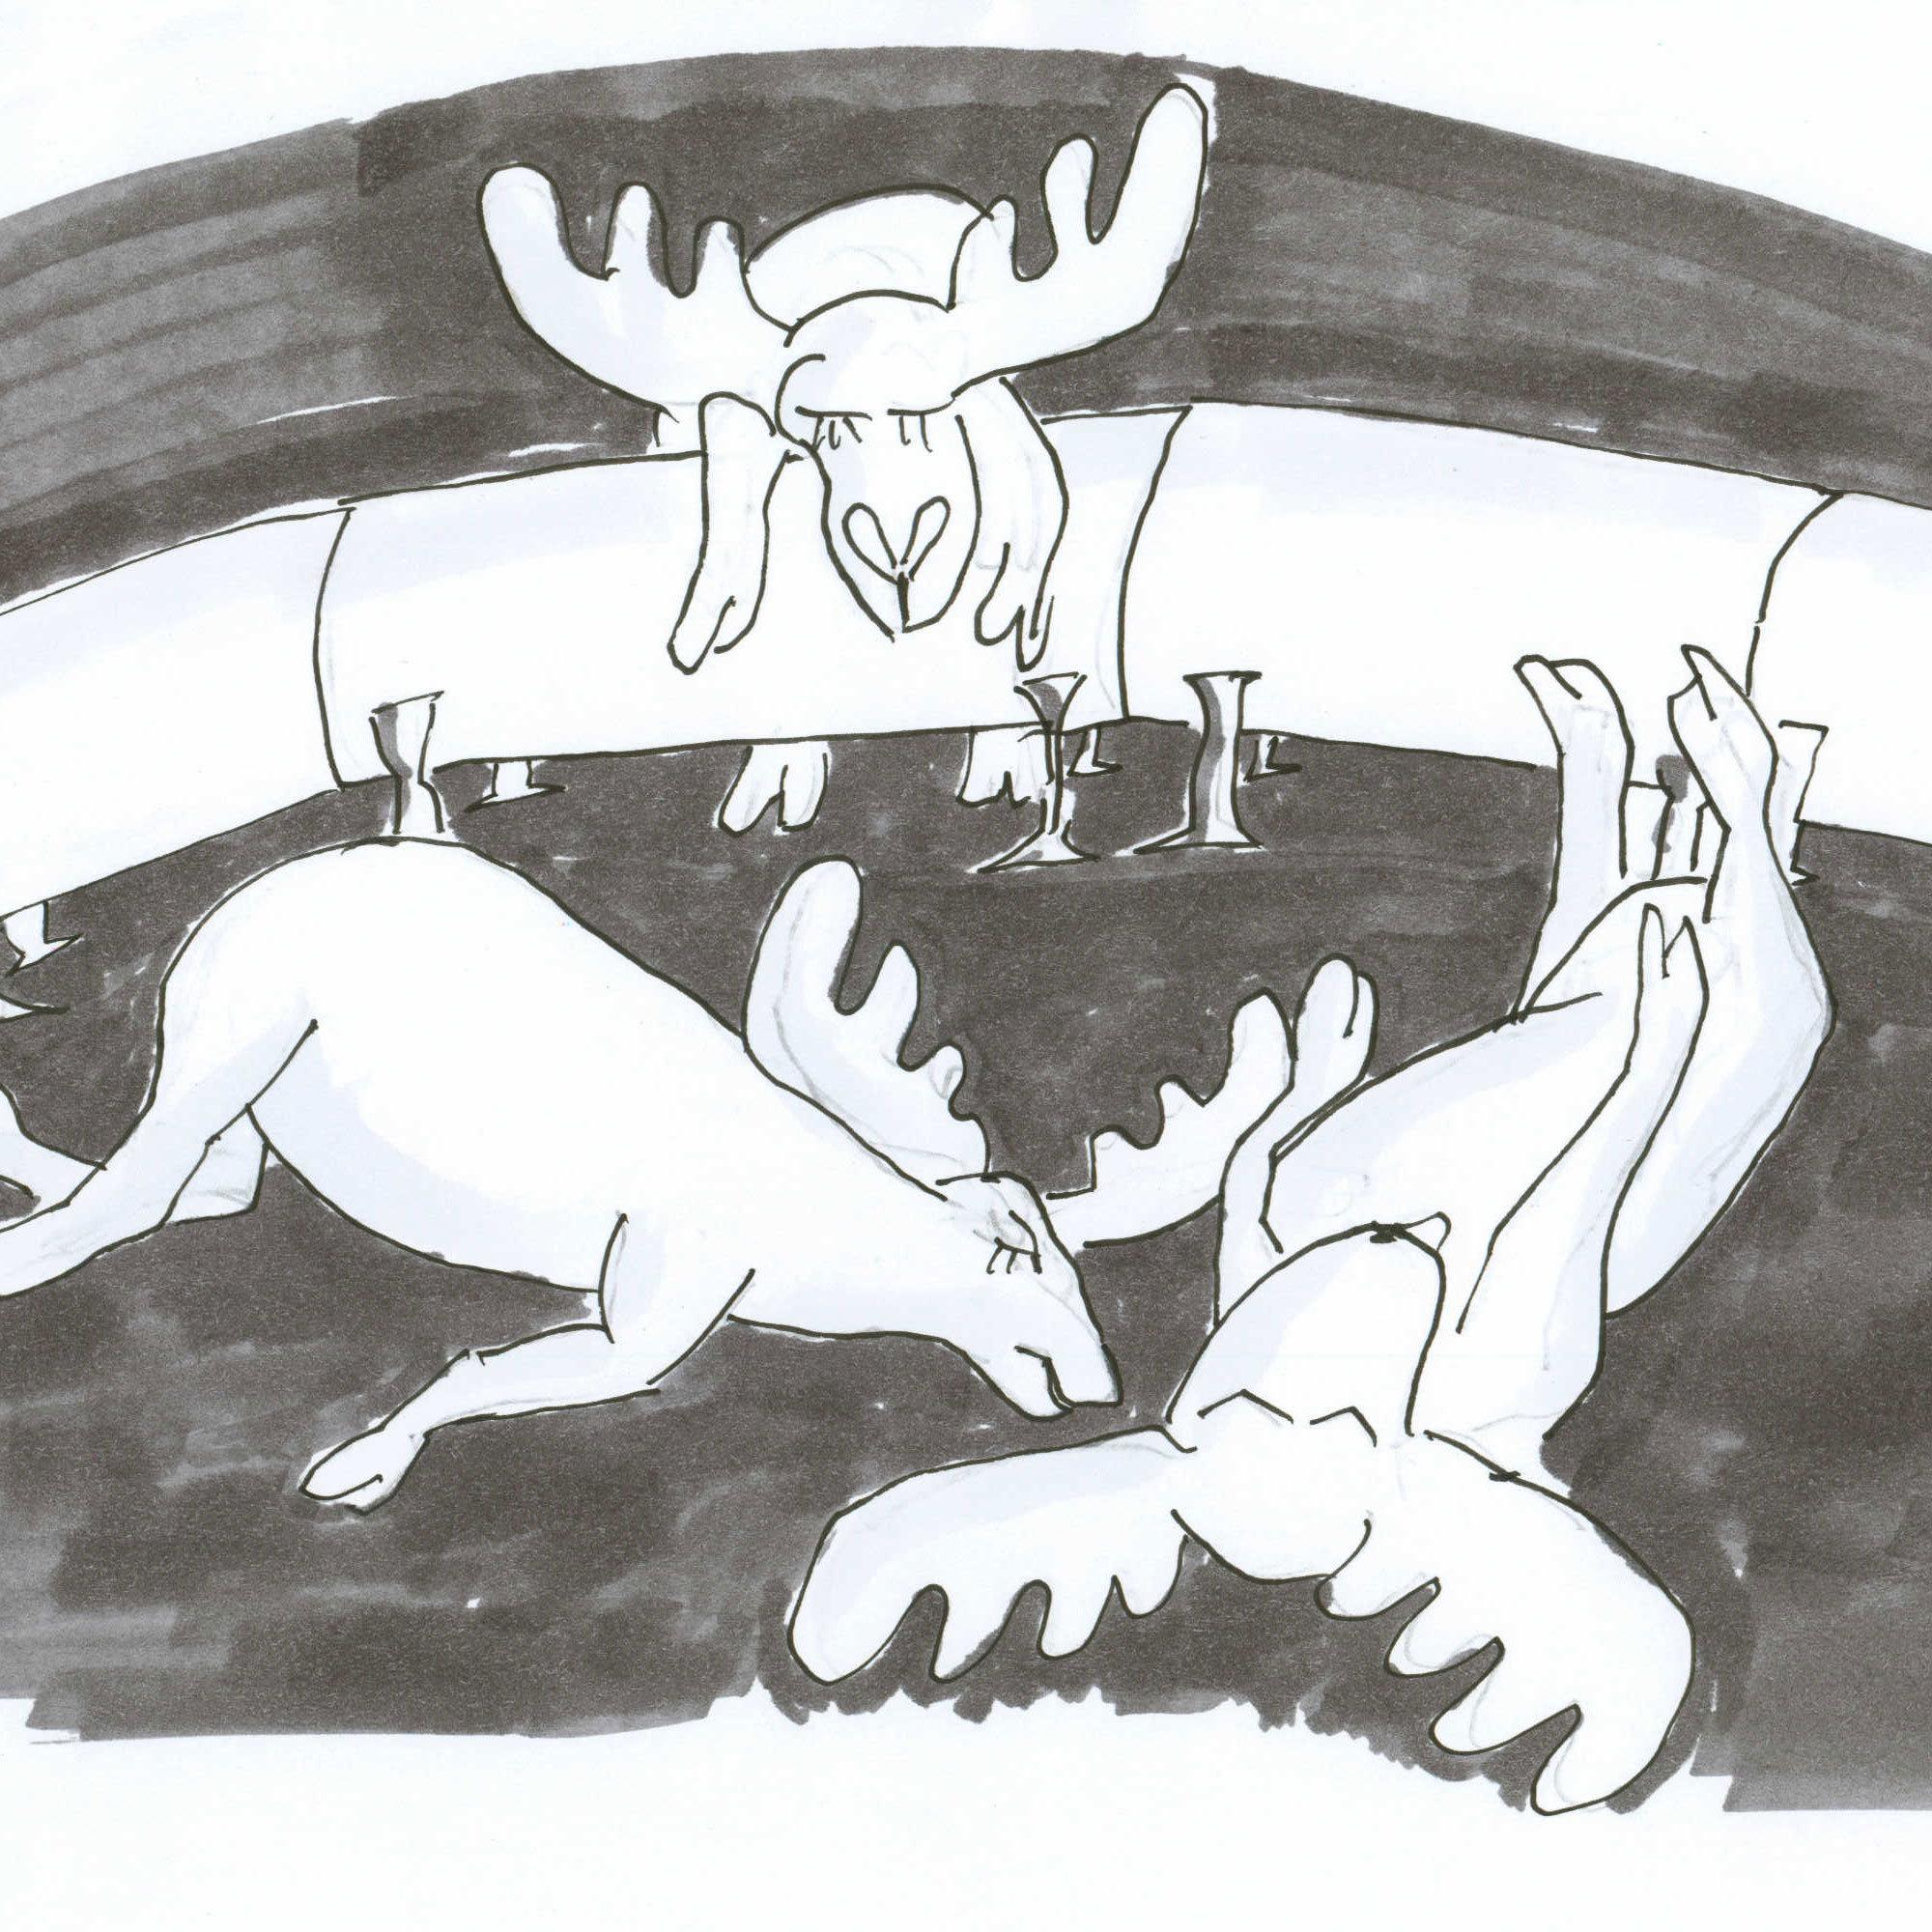 Dead caribou.